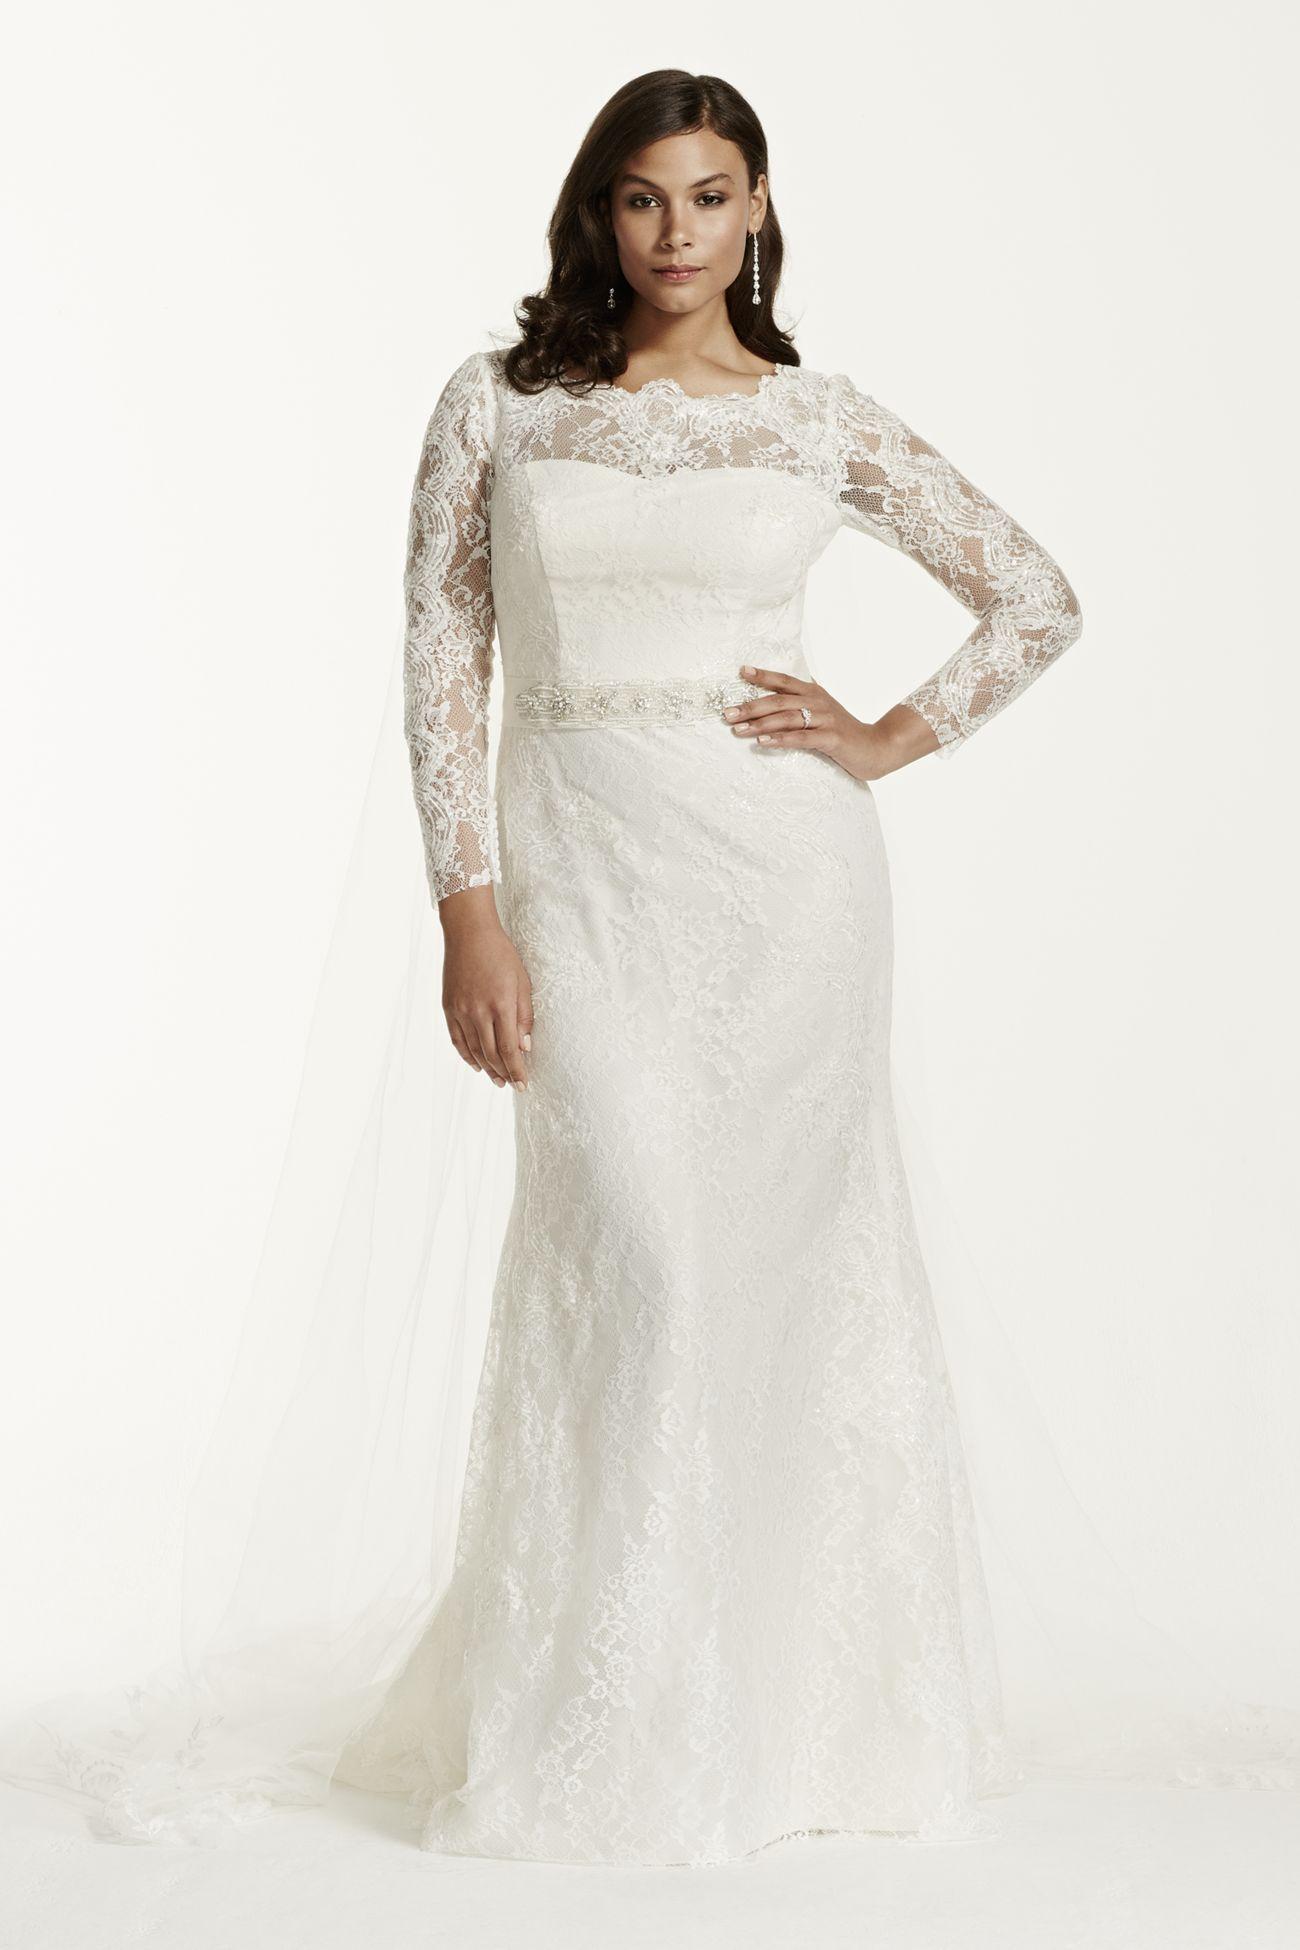 Swg wedding hair styles pinterest wedding wedding dress